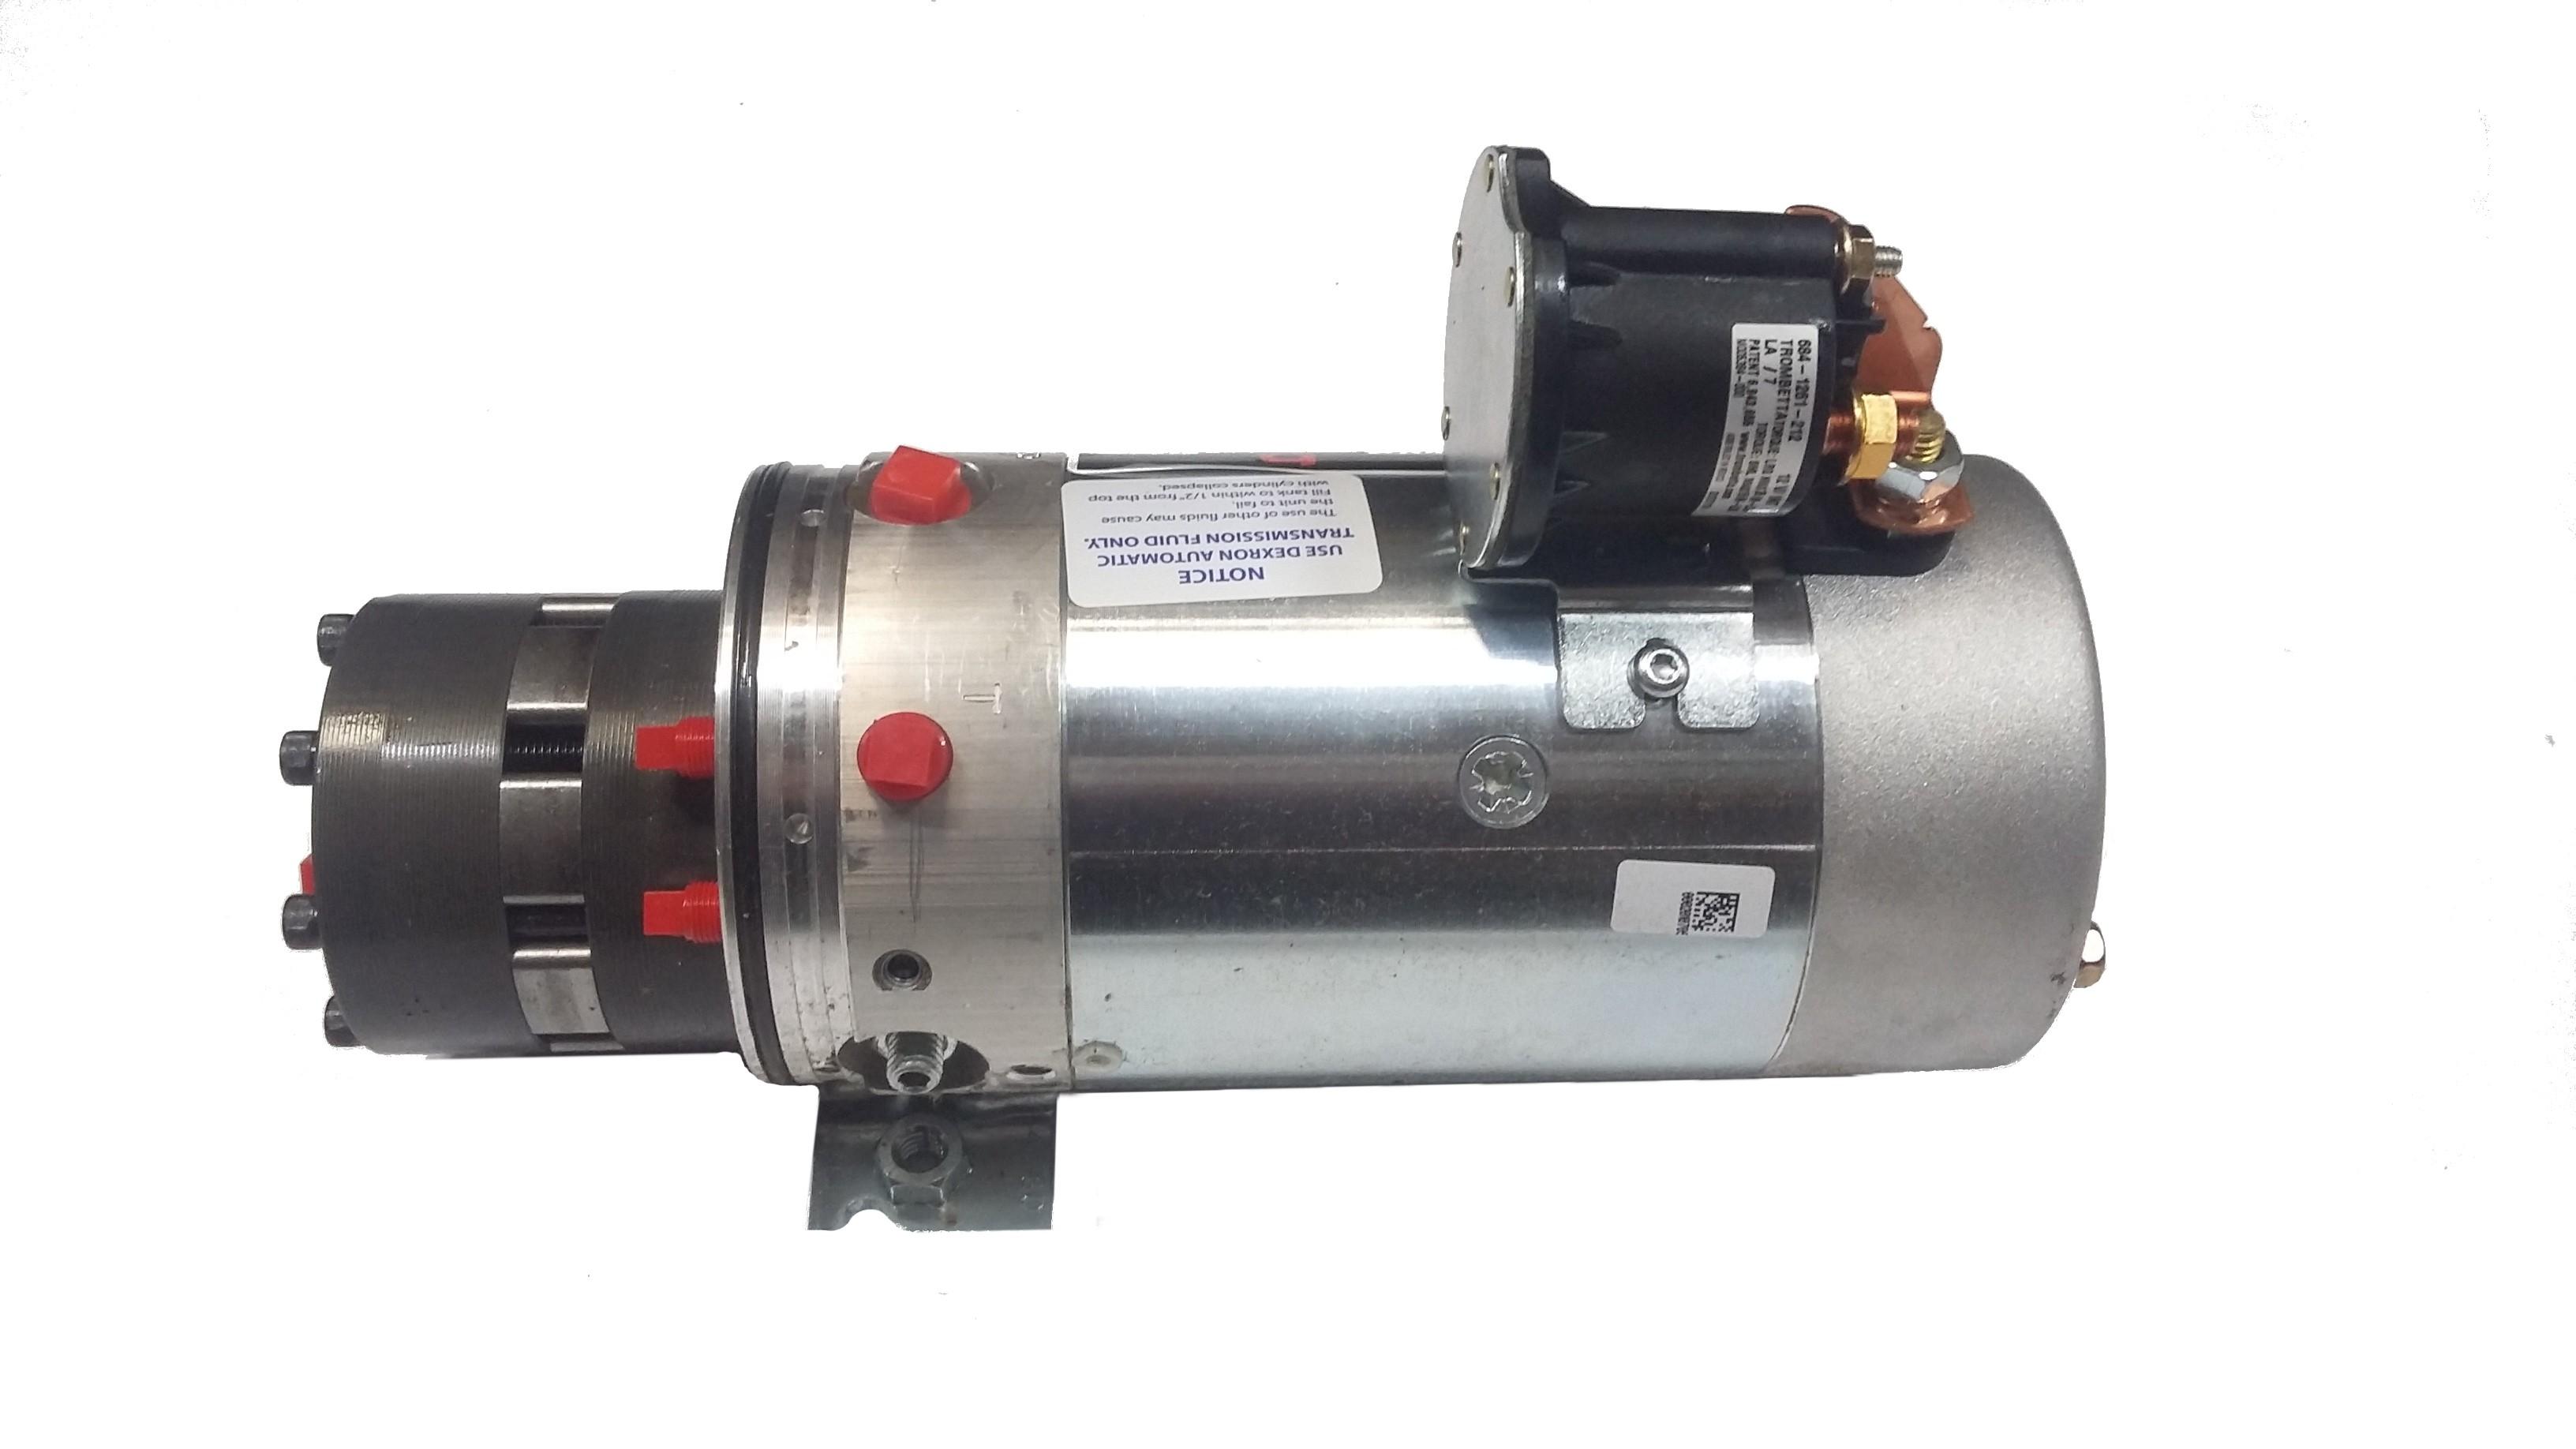 12v hydraulic pump wiring diagram sodium light ballast dc free engine image for user